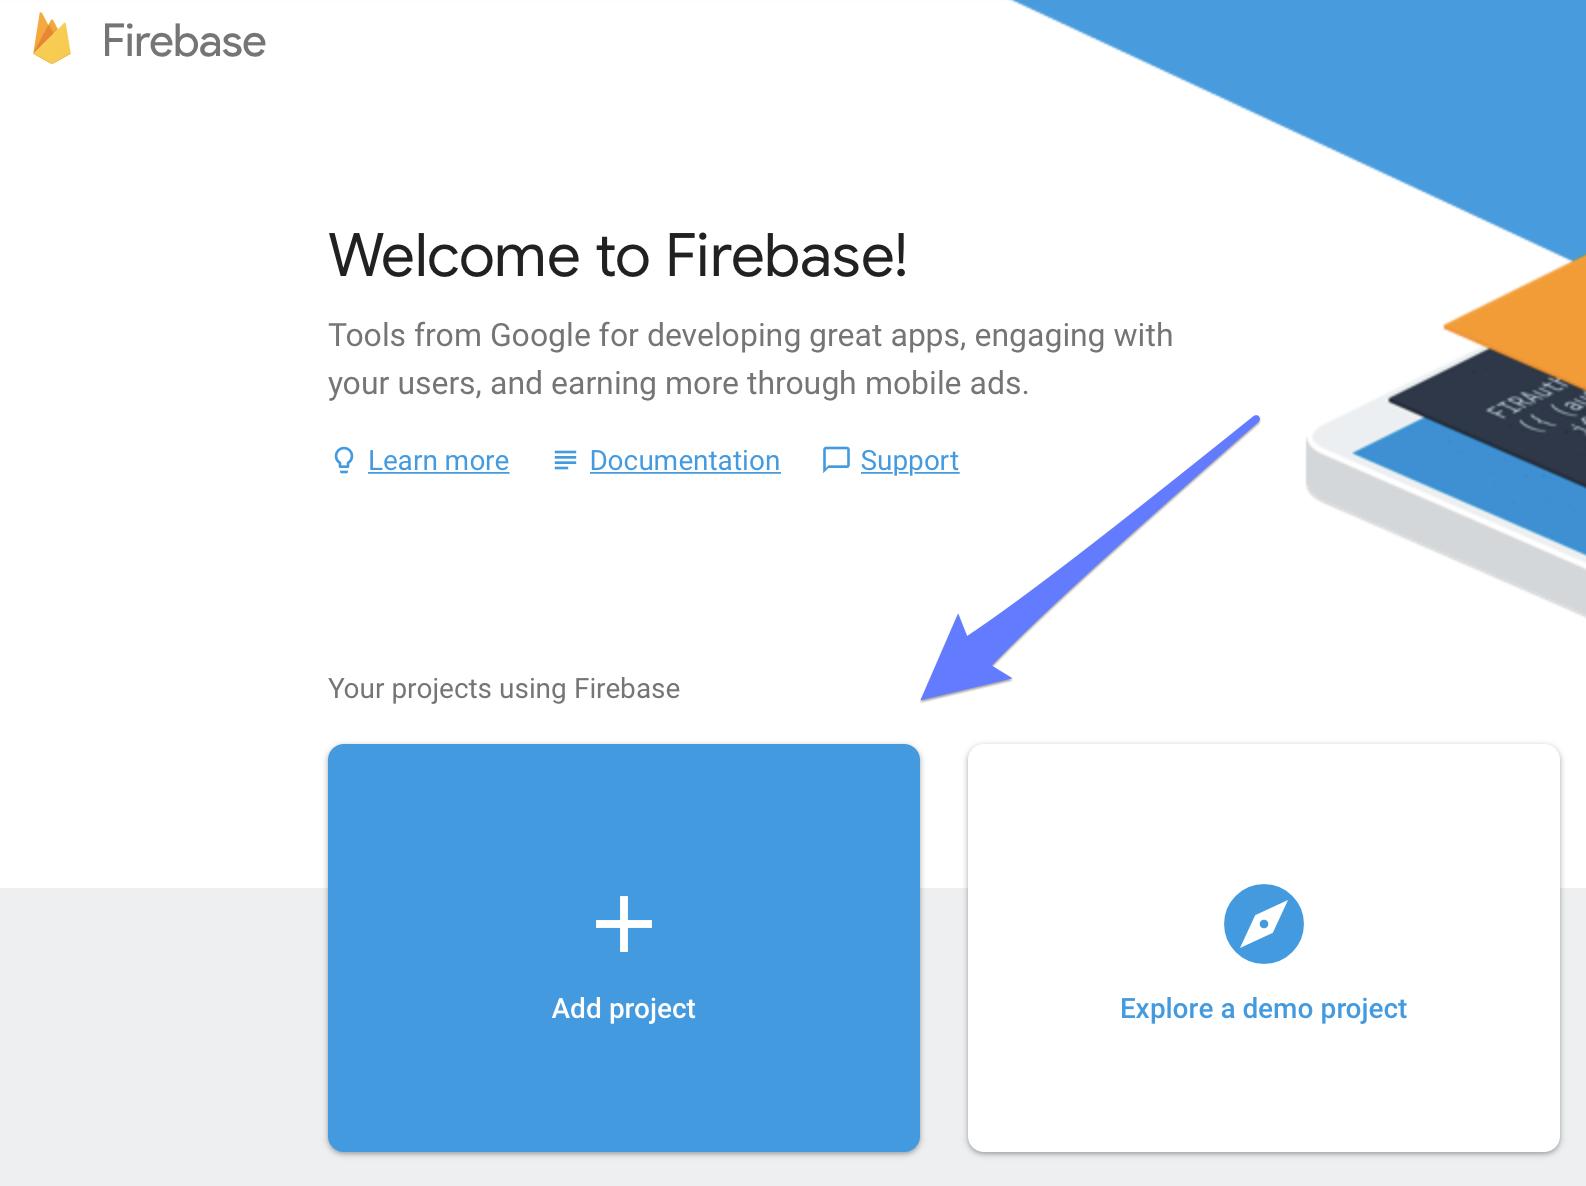 Welcome to Firebase screen